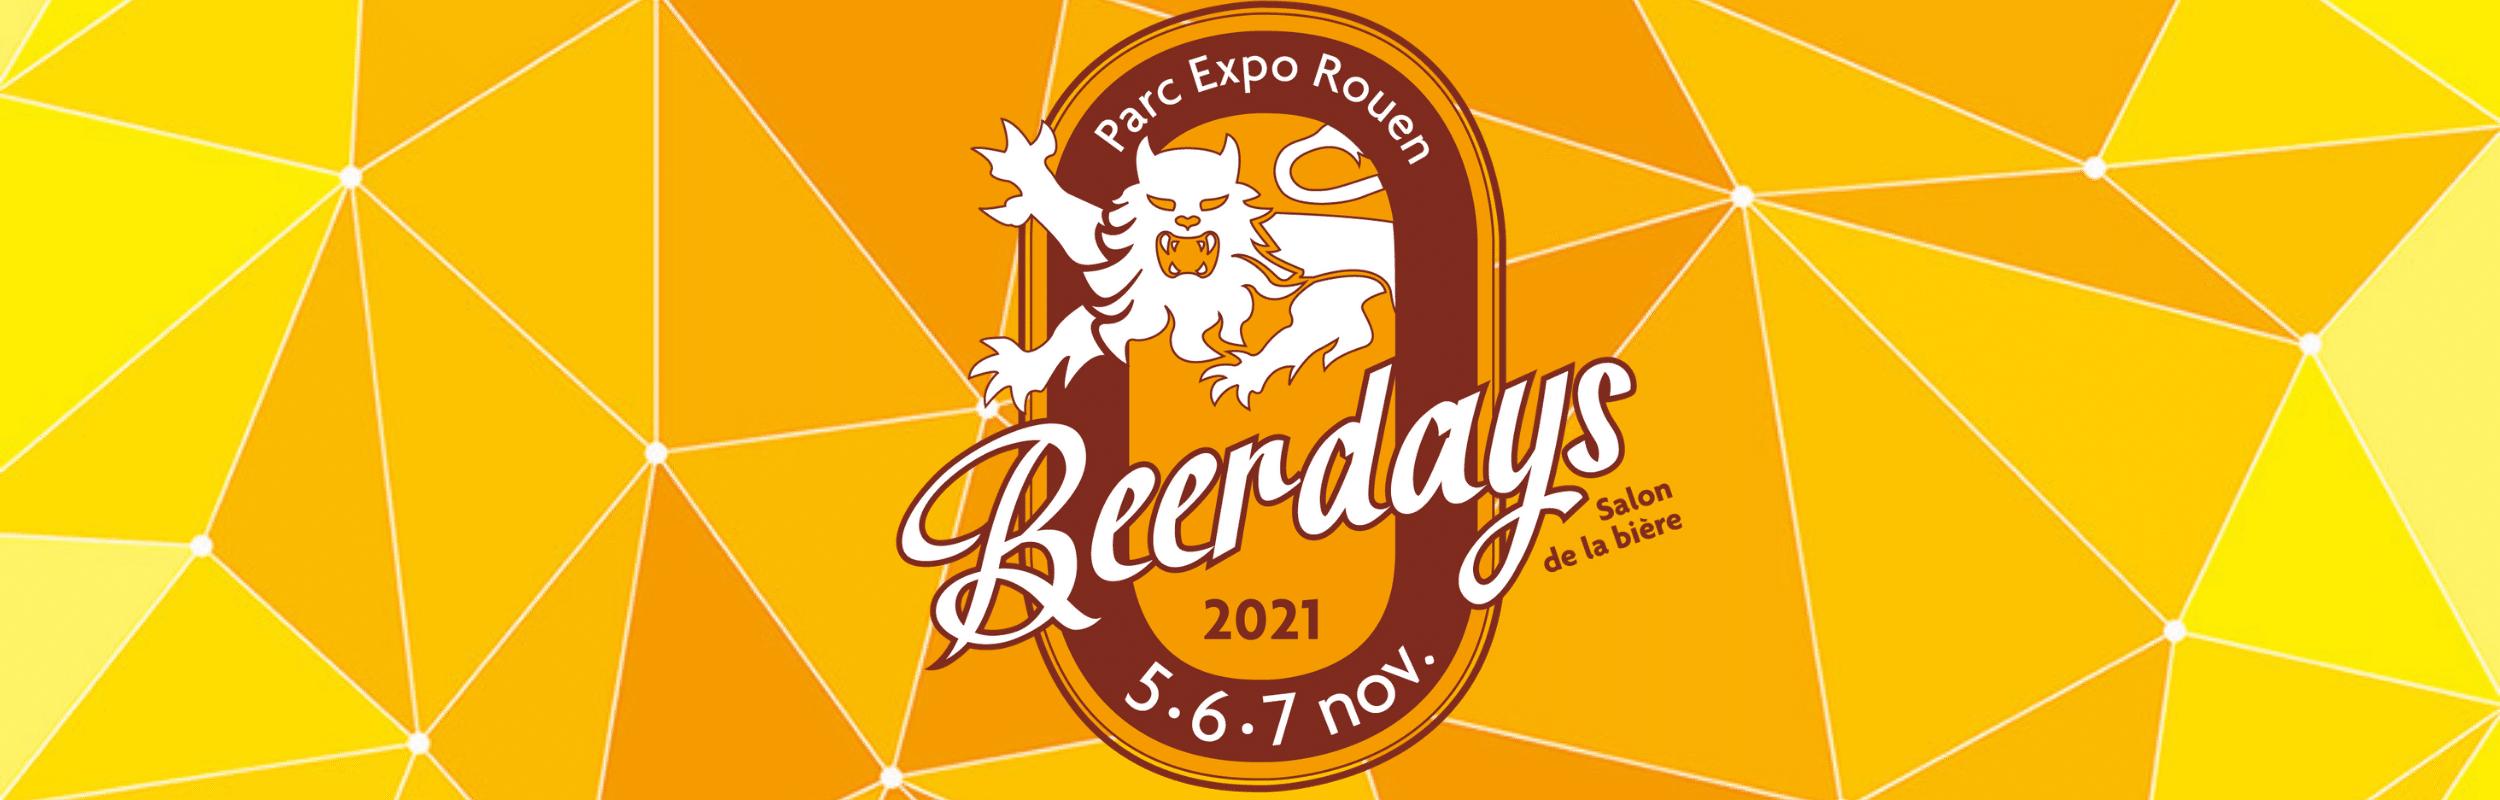 Beerdays Rouen 2021